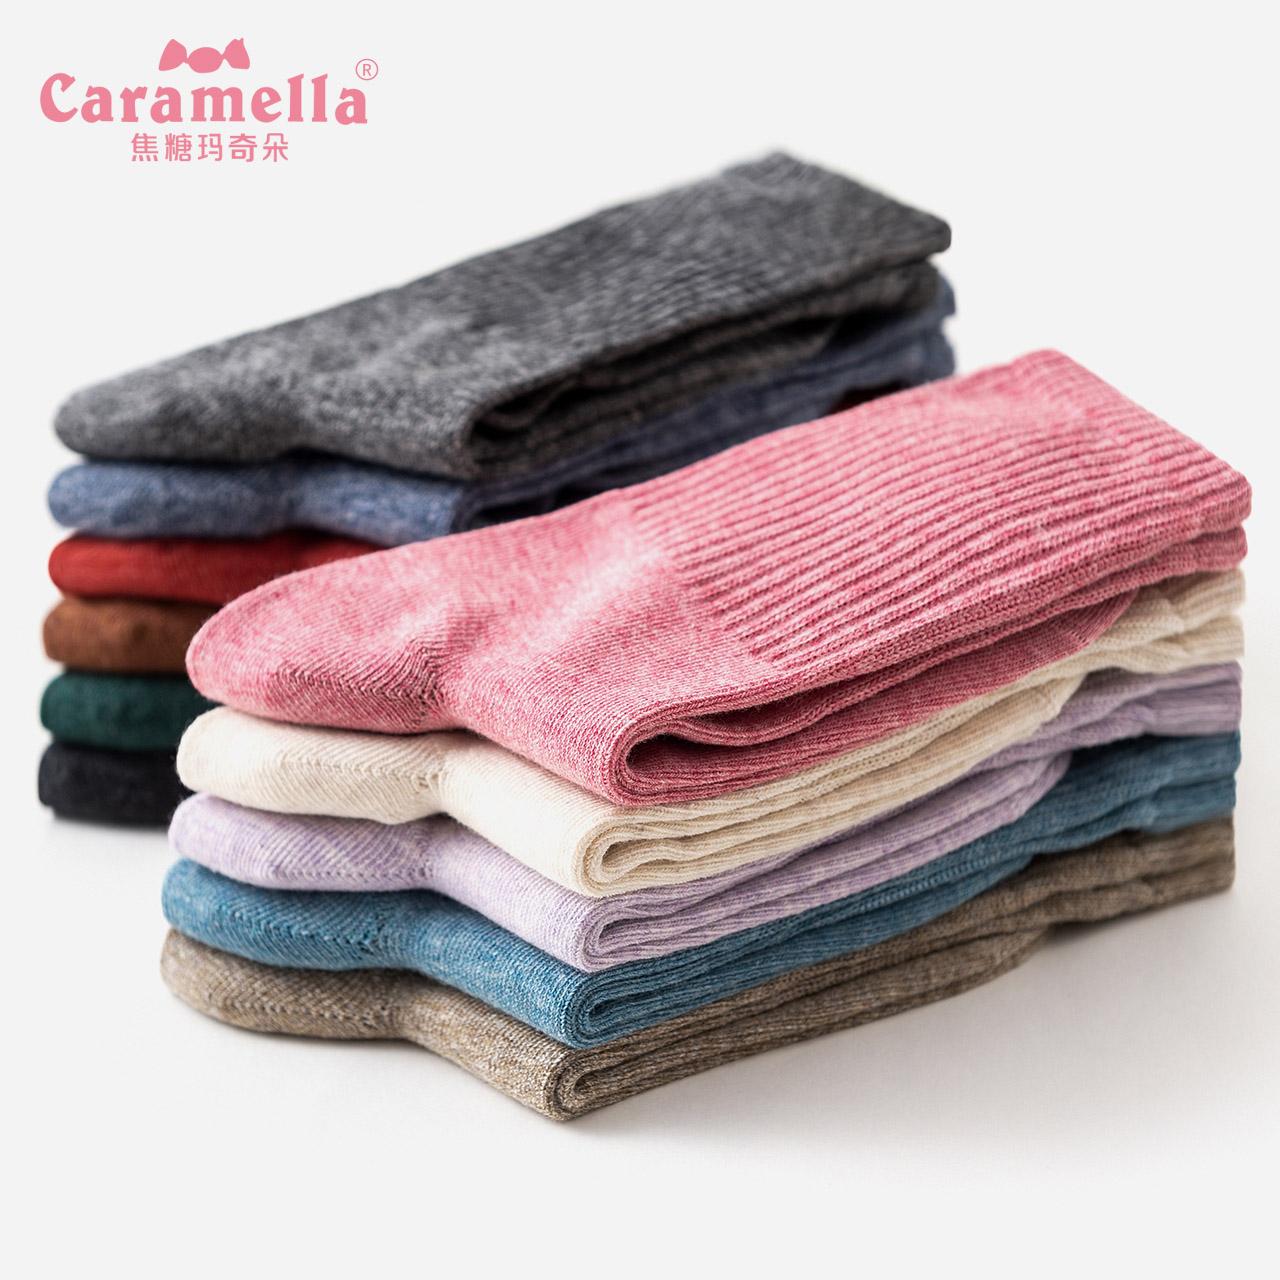 CARAMELLA长袜子女春秋冬中筒纯棉韩版学院风百搭潮个性薄堆堆袜